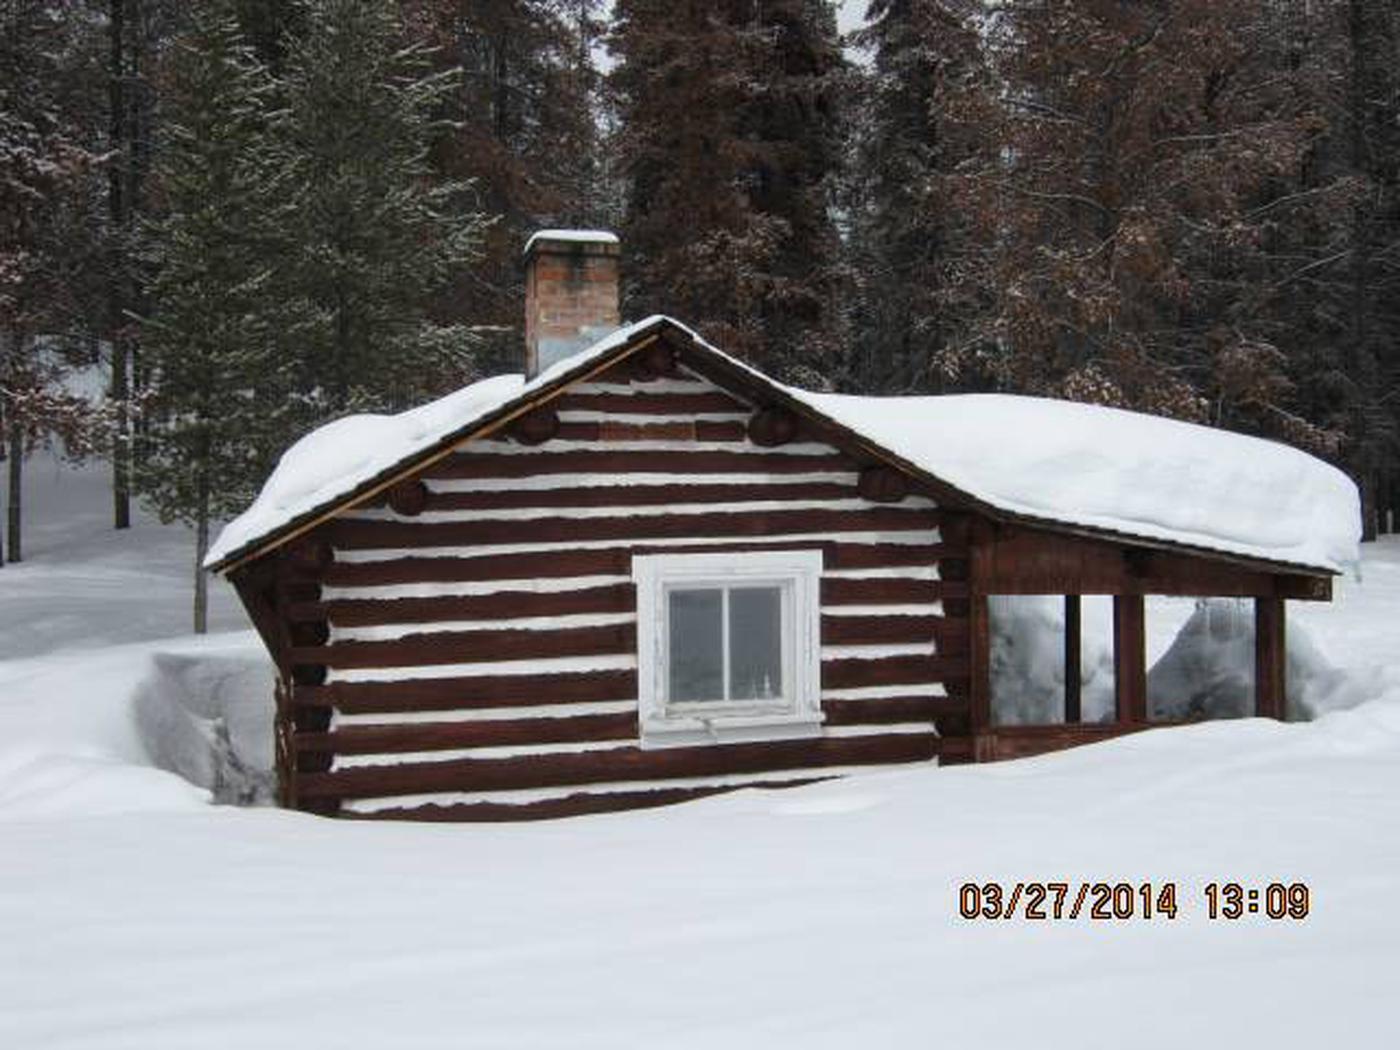 HOGAN CABINA winter destination.